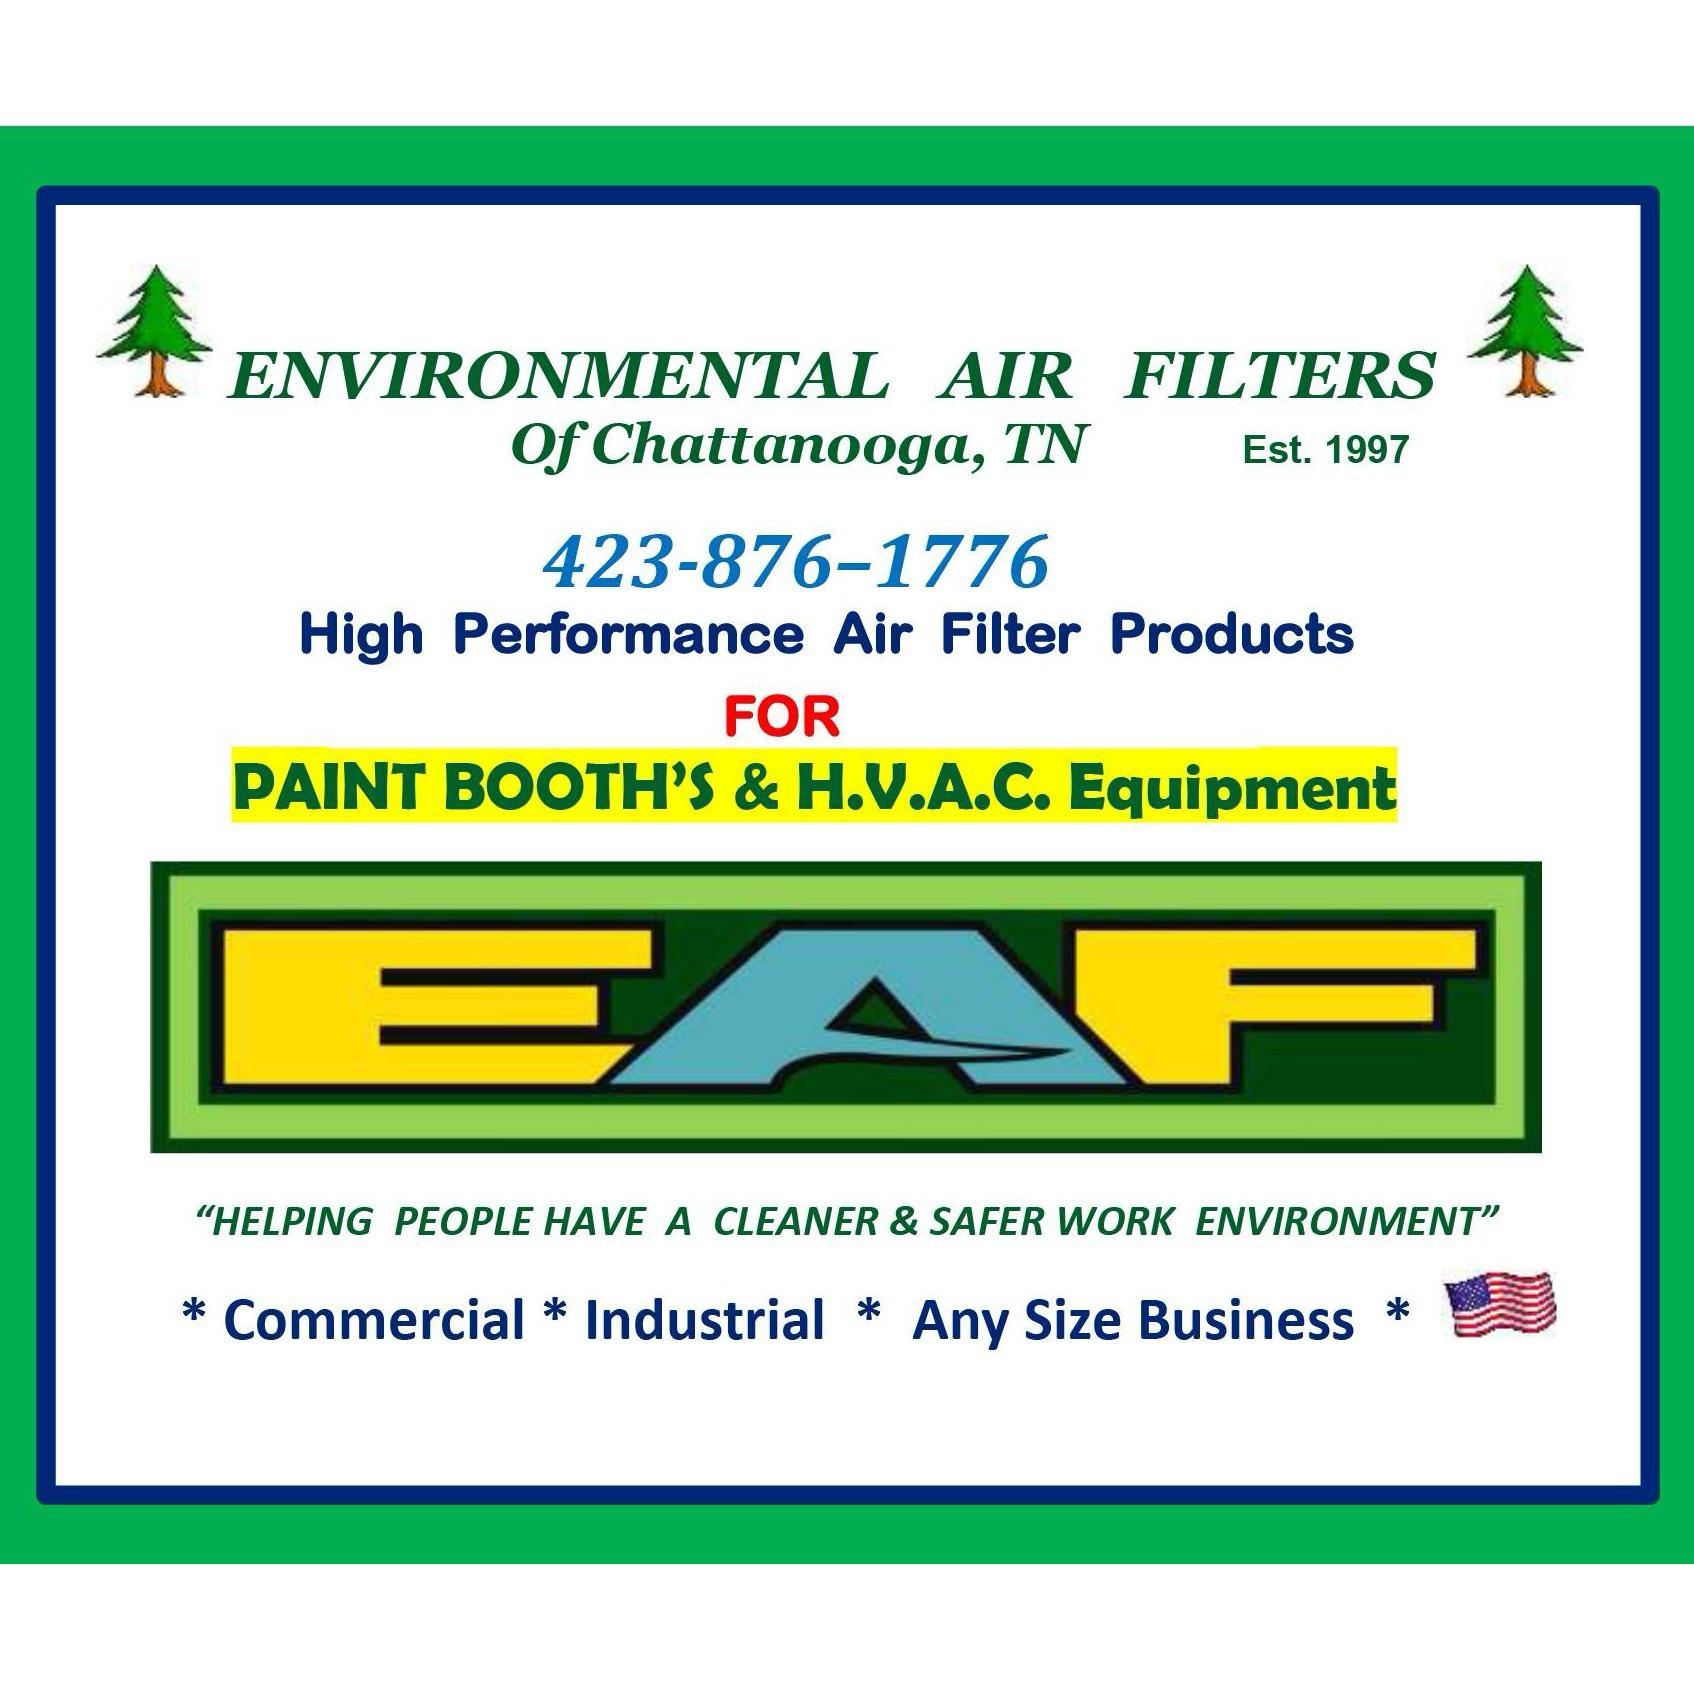 Environmental Air Filters image 6